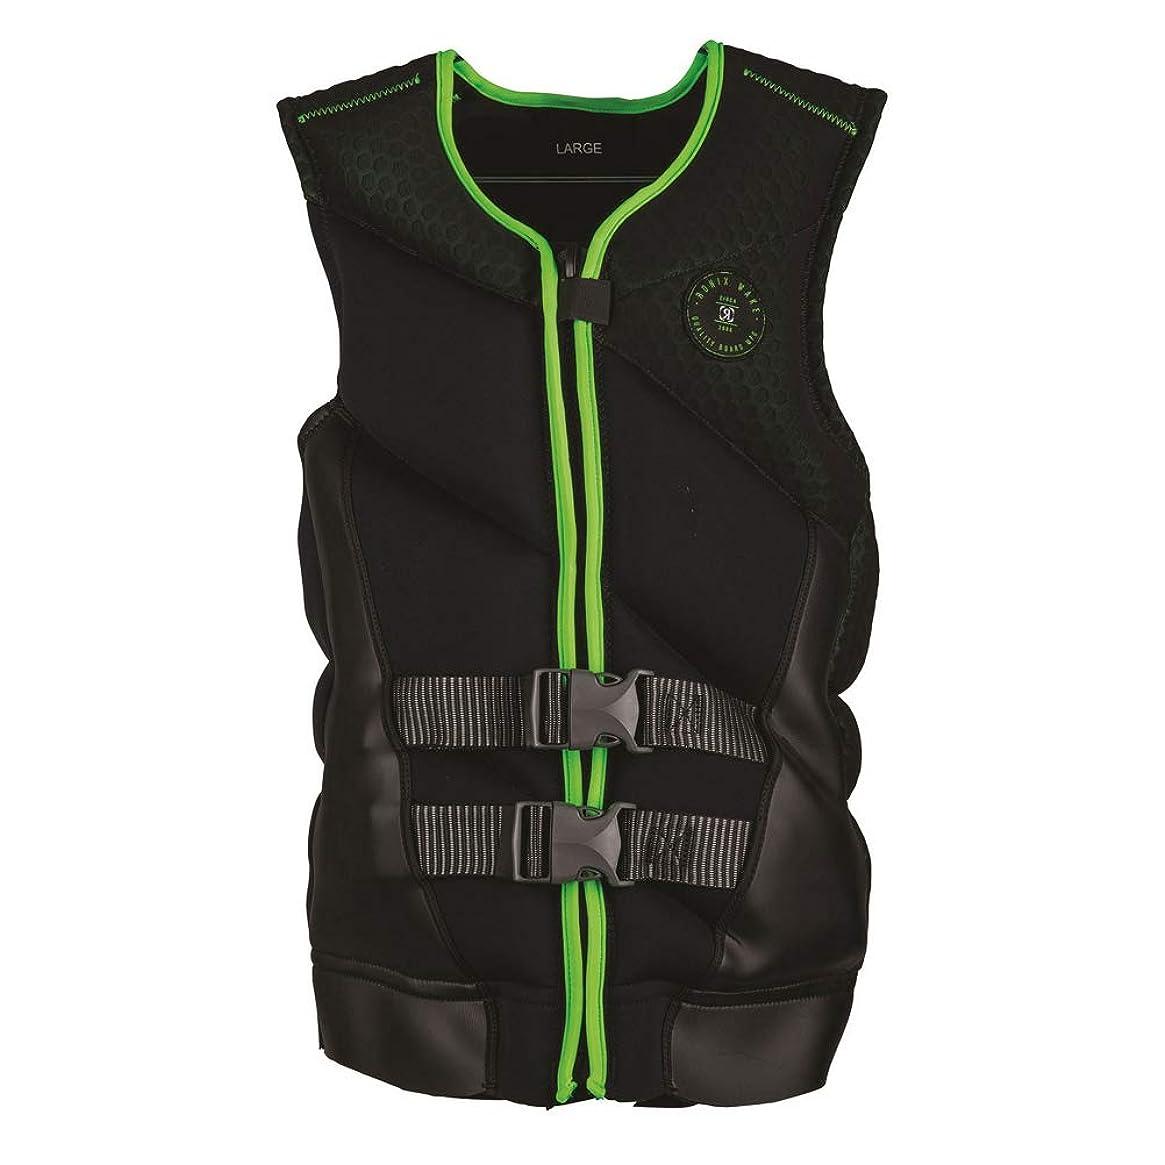 Ronix One Capella 2.0 - CGA Life Vest - Black/Lime (2019)